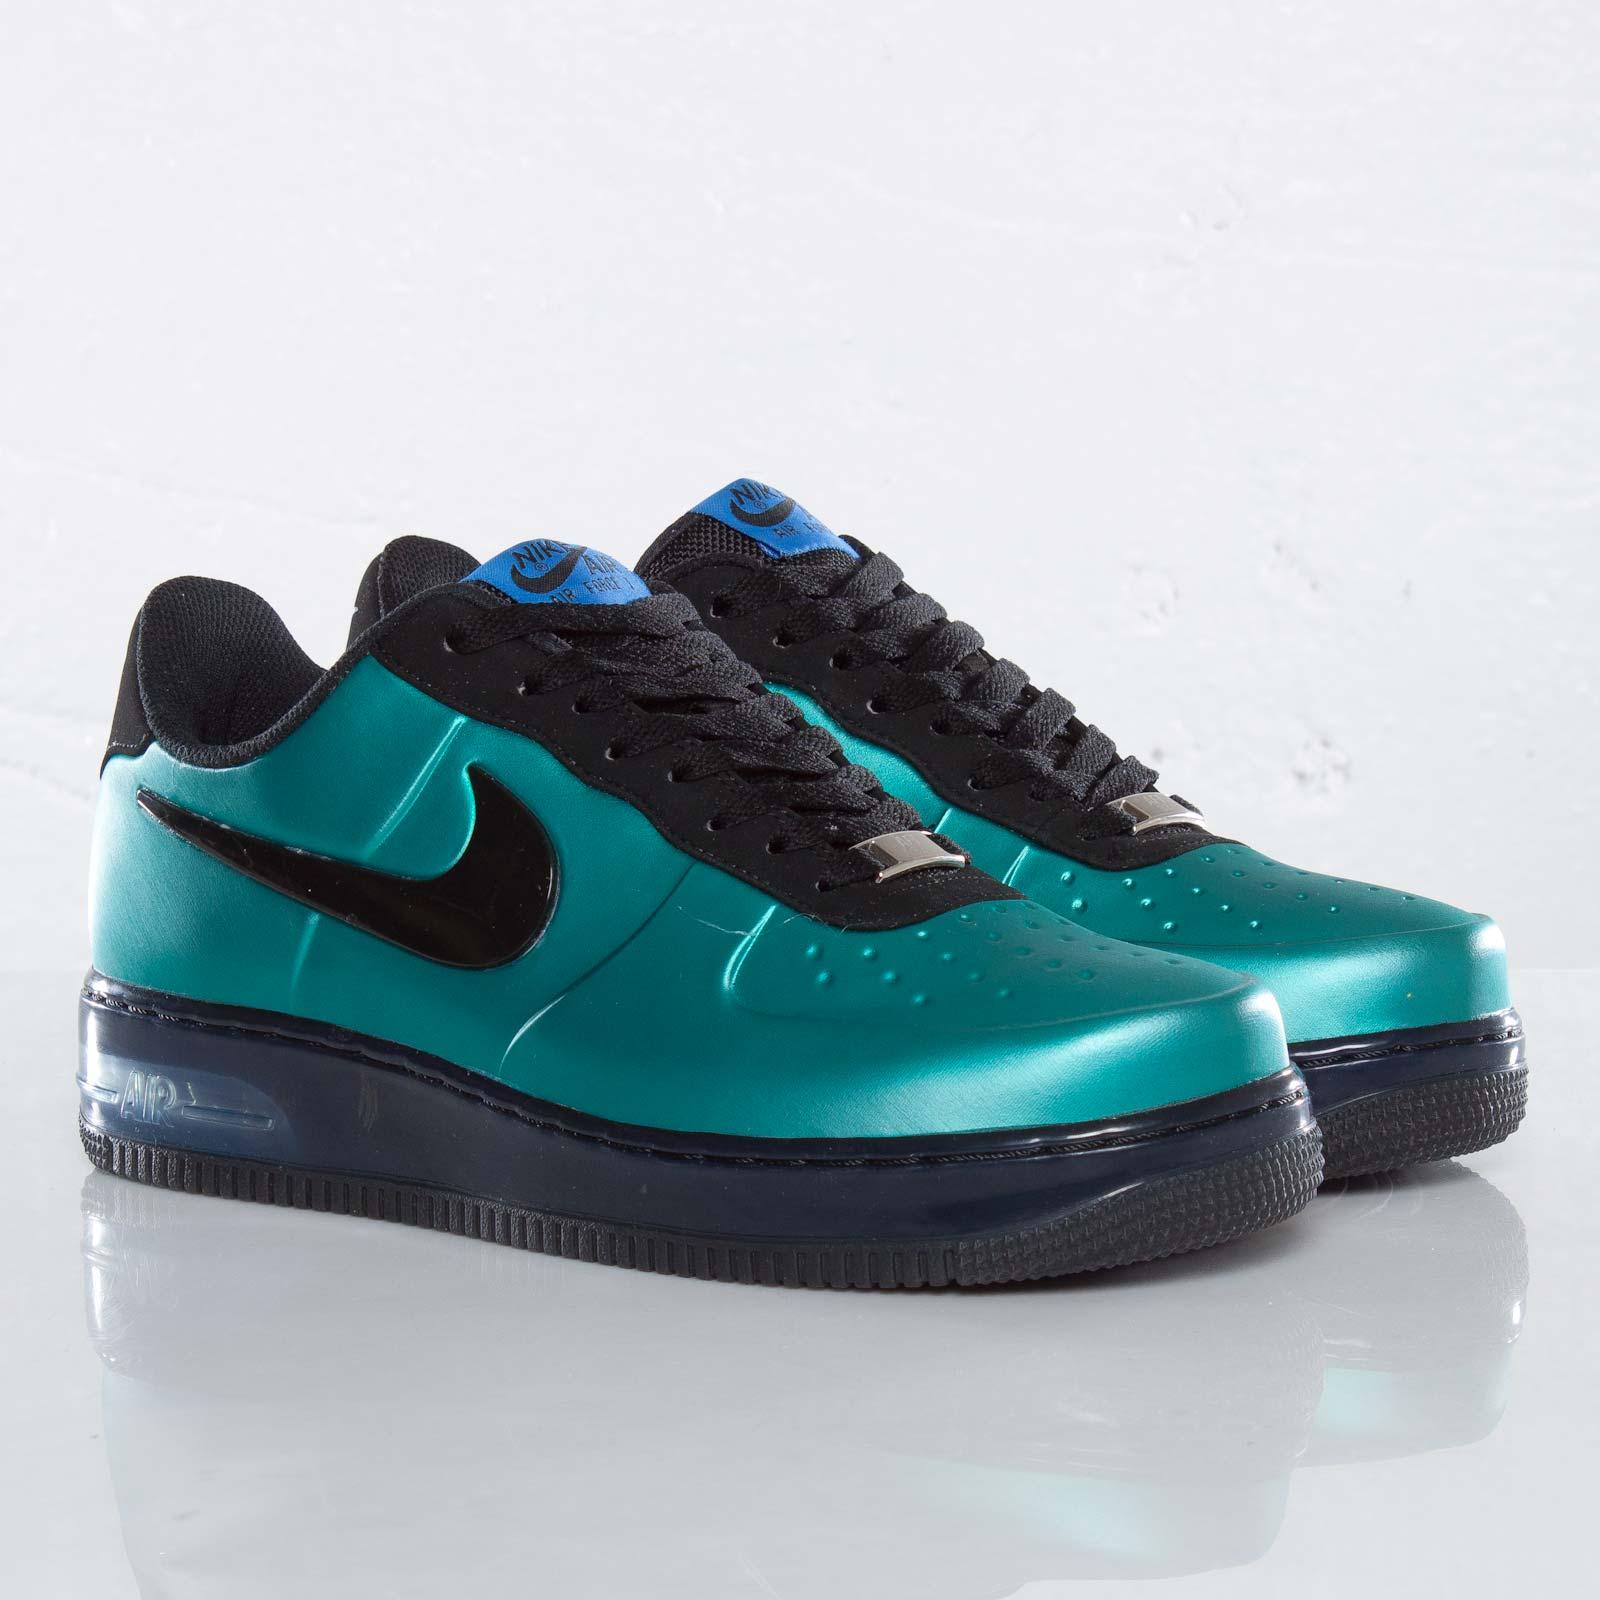 buy online 08ca3 5d968 Nike Air Force 1 Foamposite Pro Low